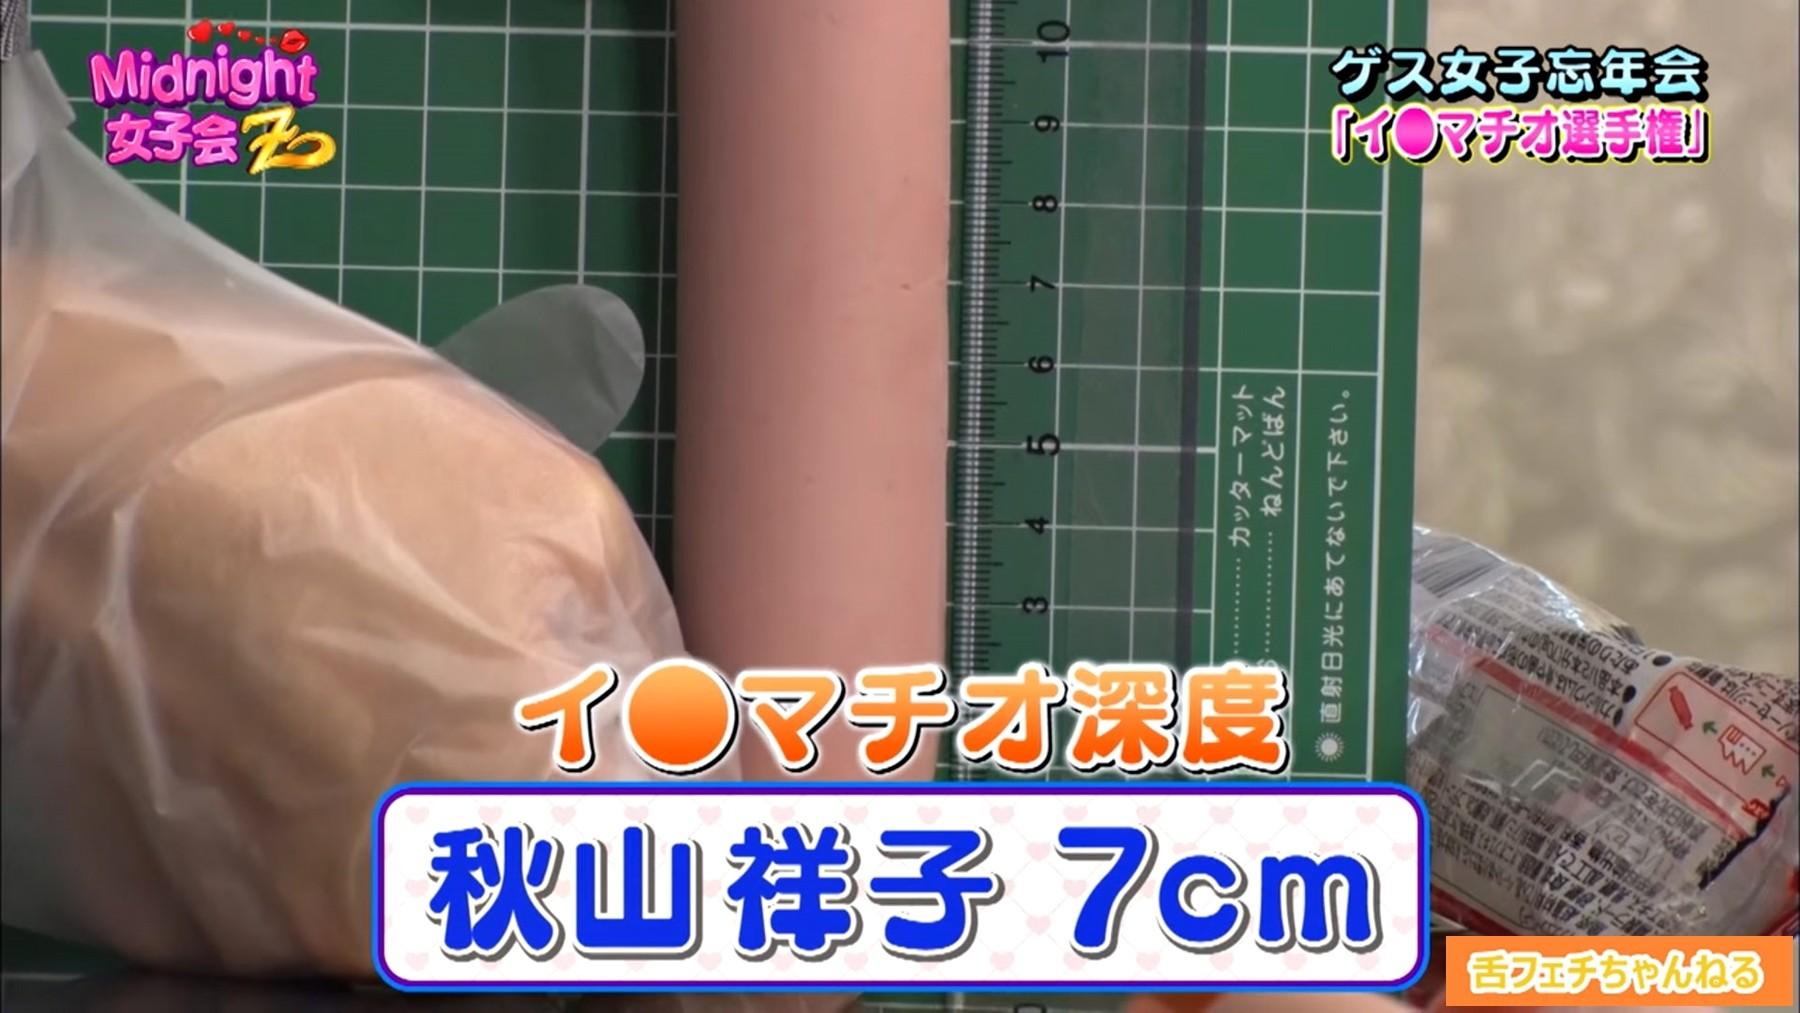 Midnight女子会 イラマチオ選手権 (34)